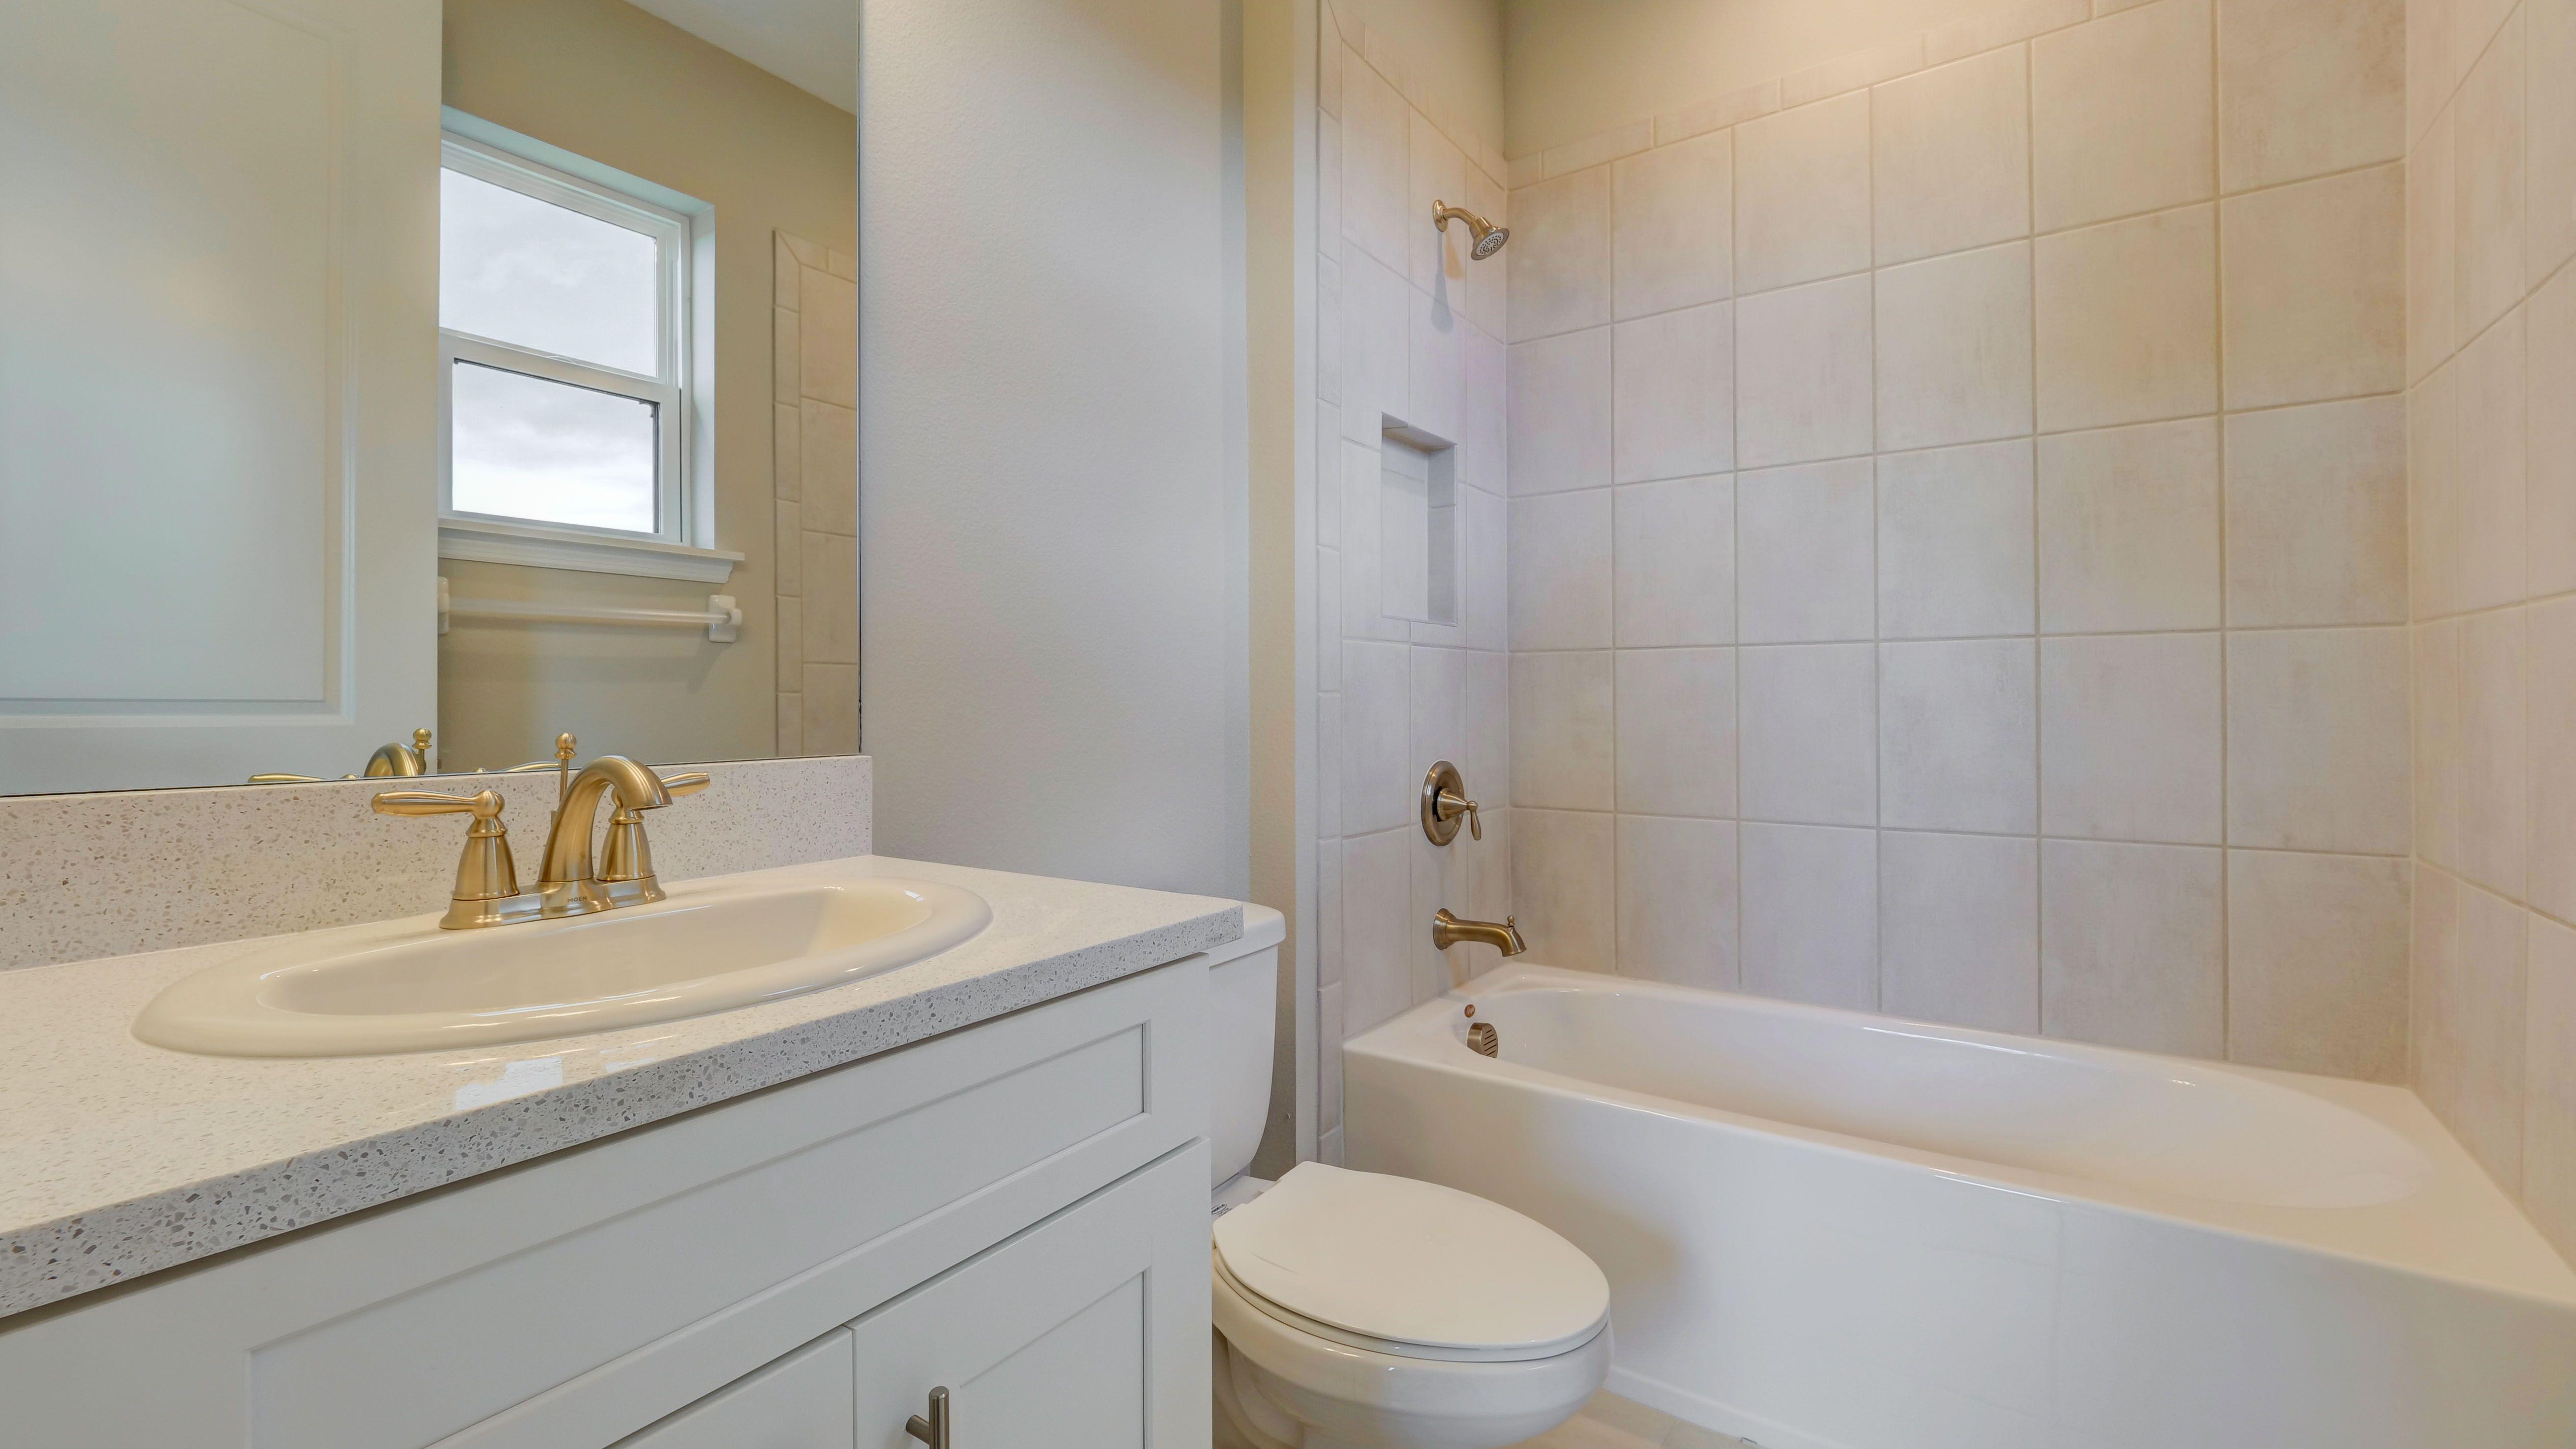 Bathroom featured in the Santa Rosa By Taylor Morrison in Sarasota-Bradenton, FL